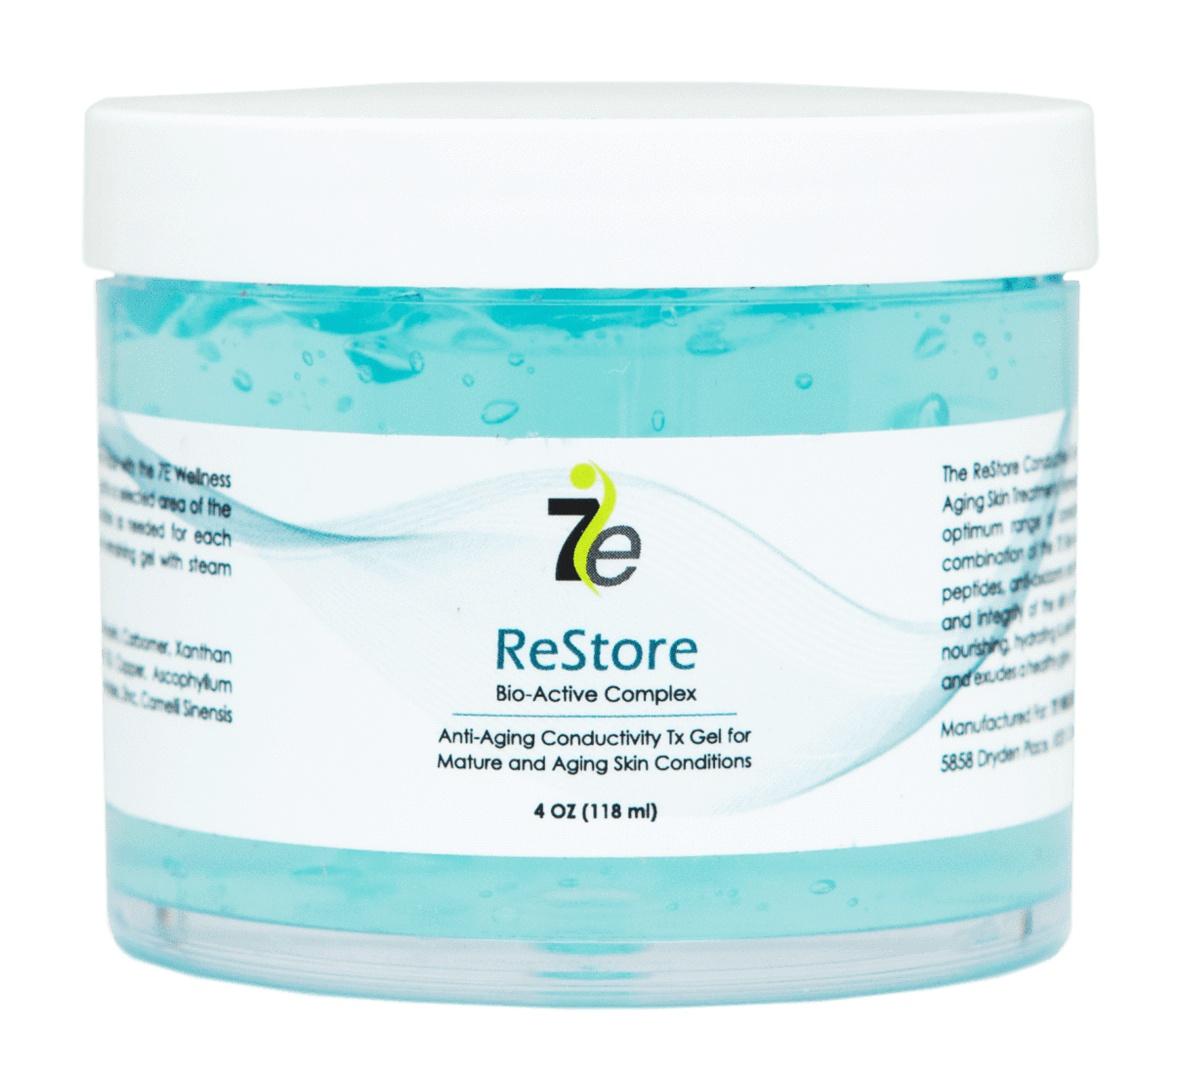 7e Restore Anti-Aging Conductive Gel